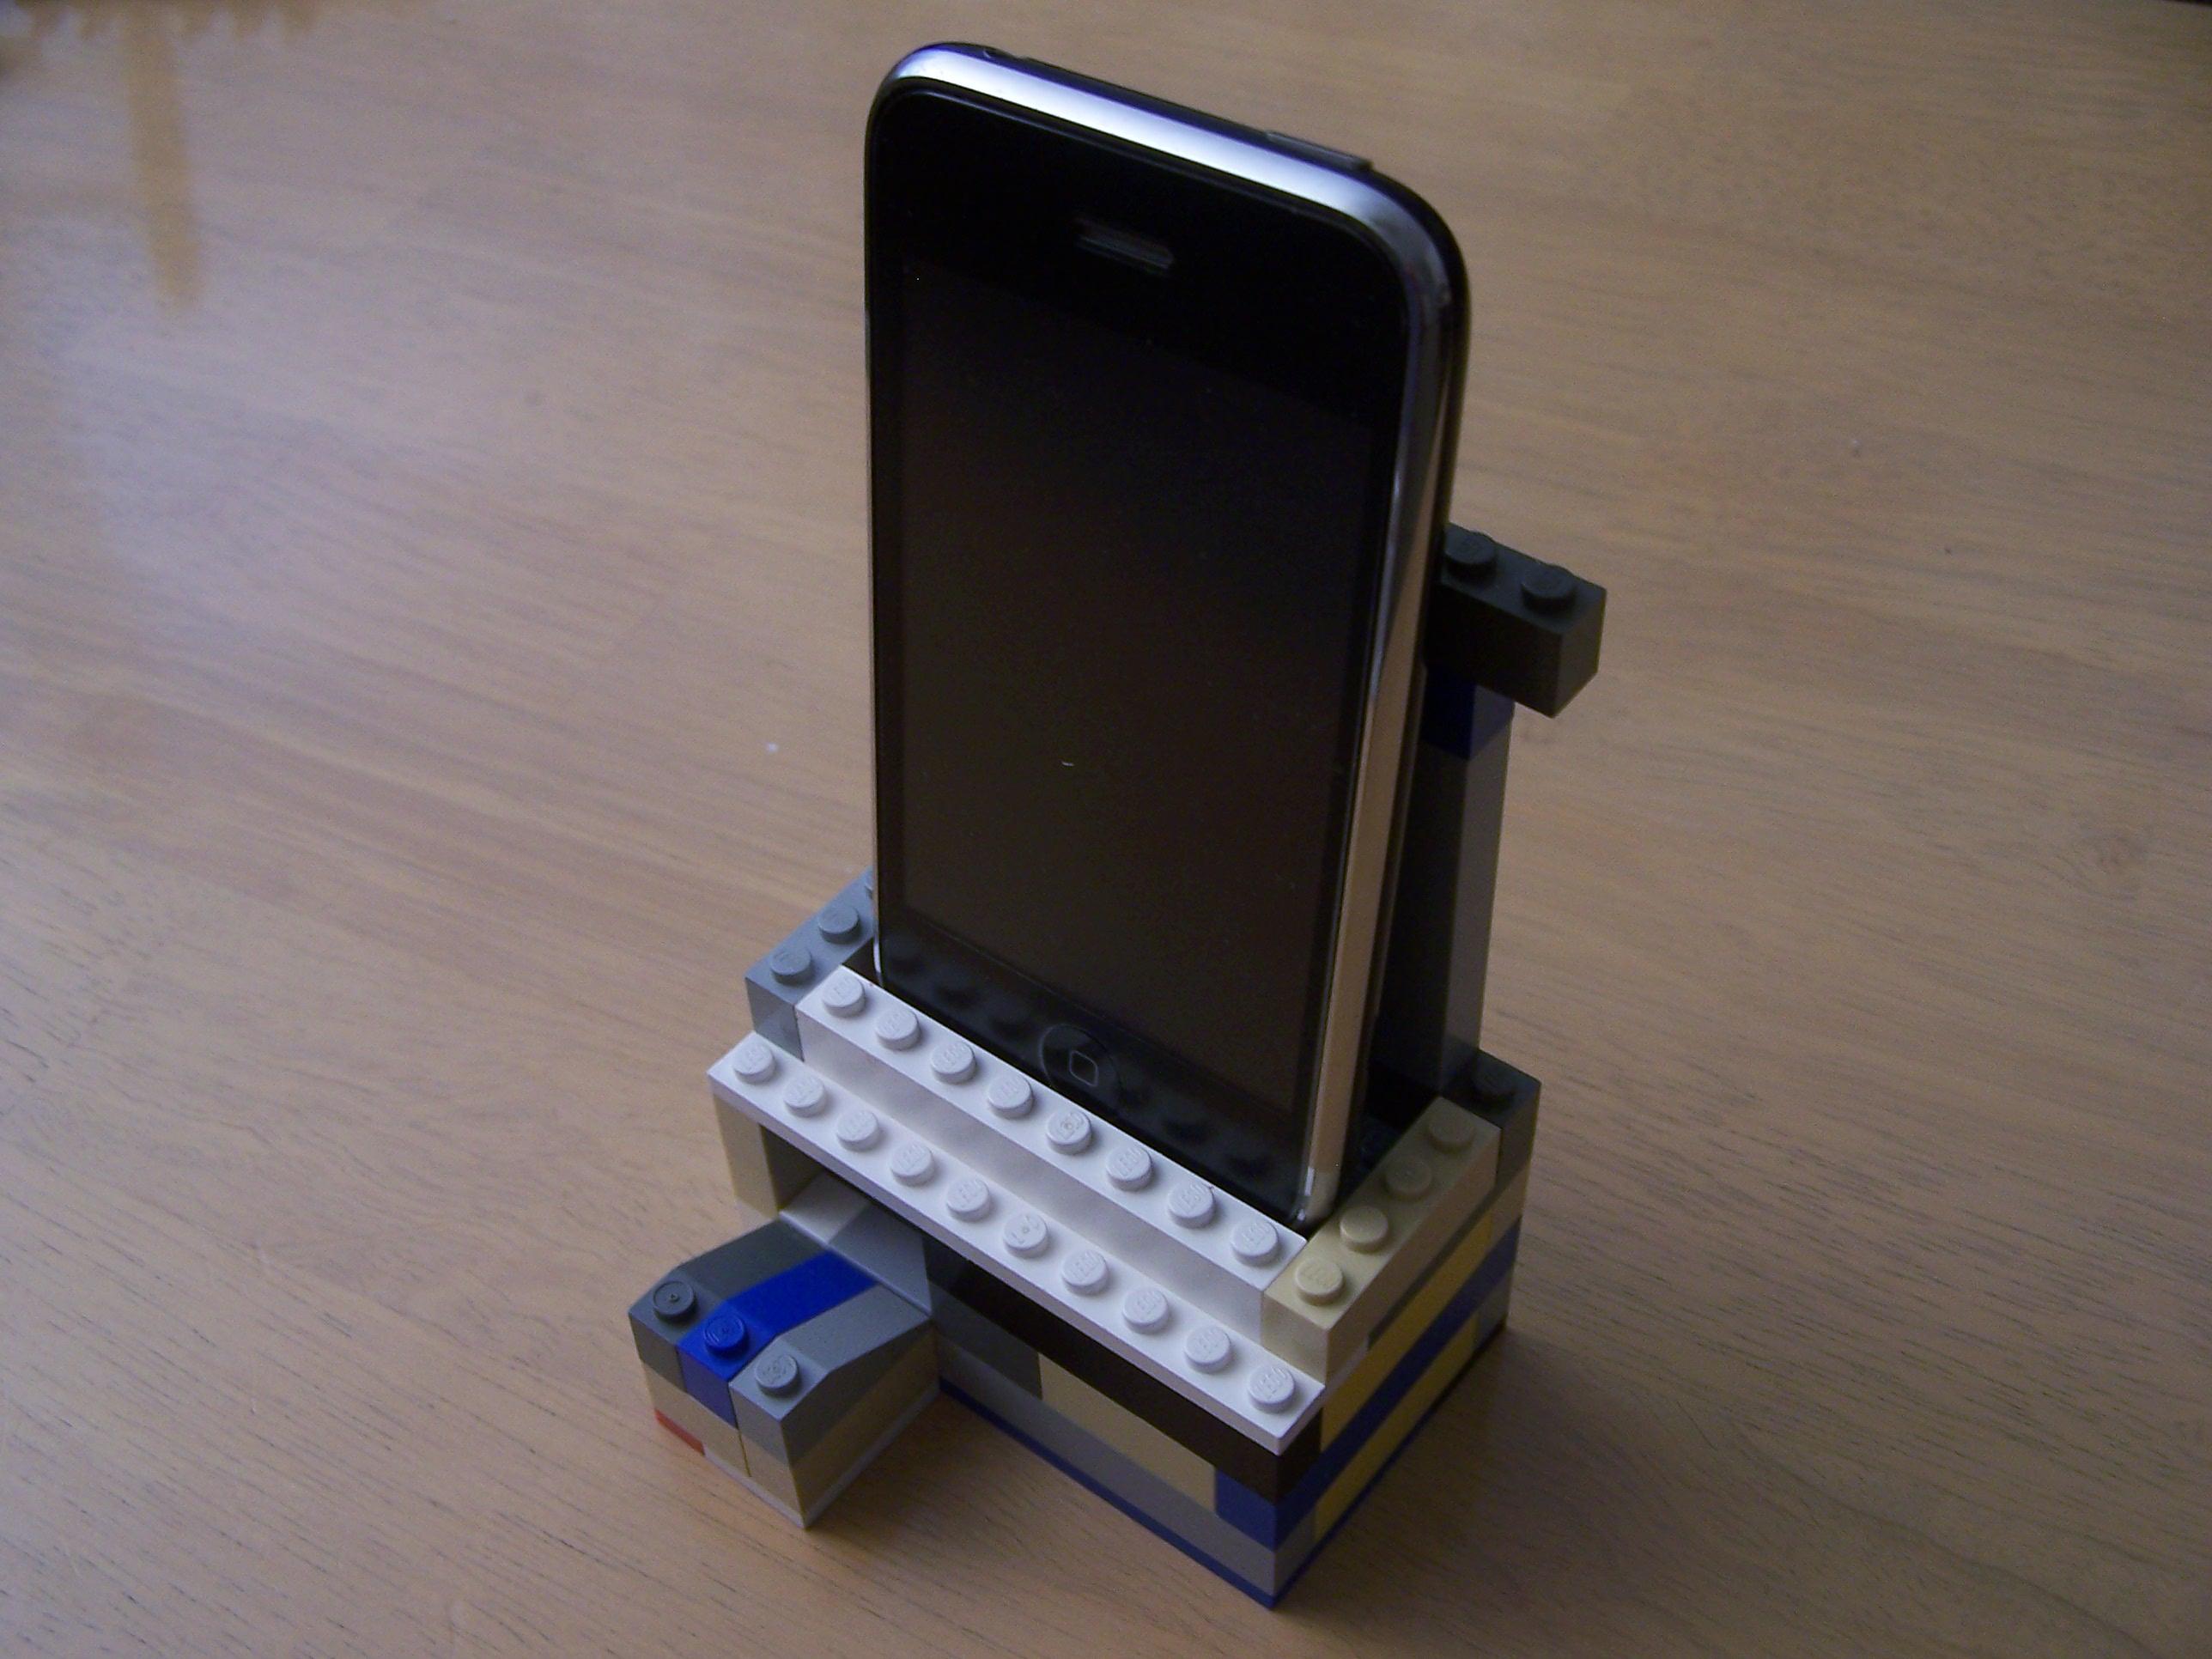 Lego iPhone Speaker Stand